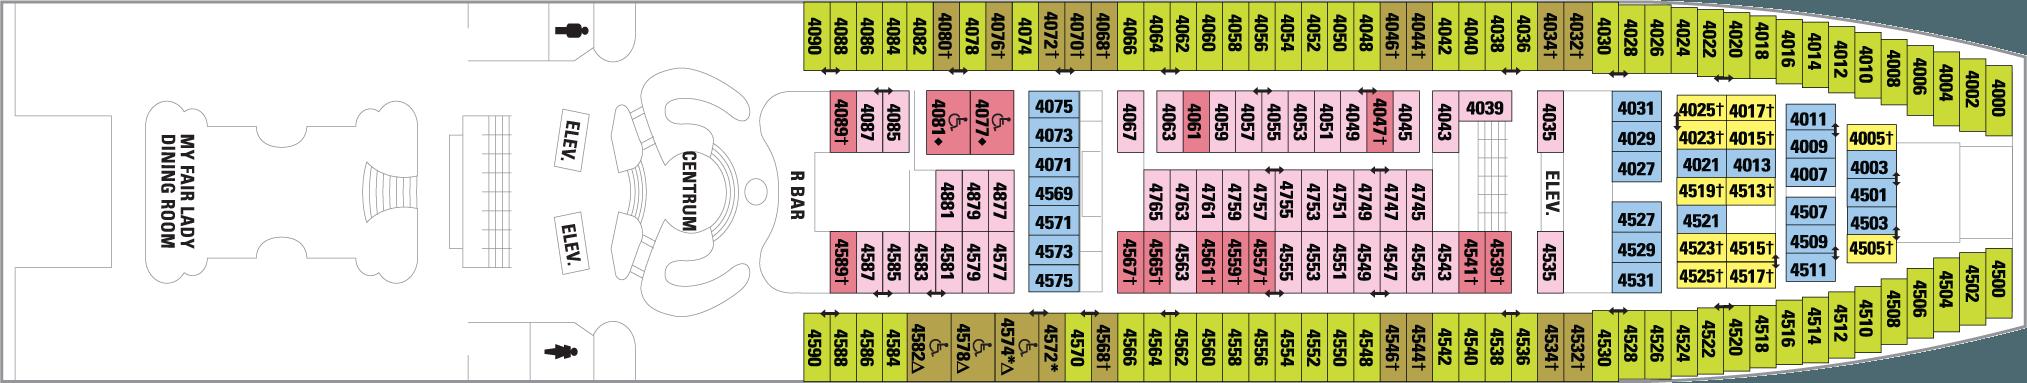 Deck 4